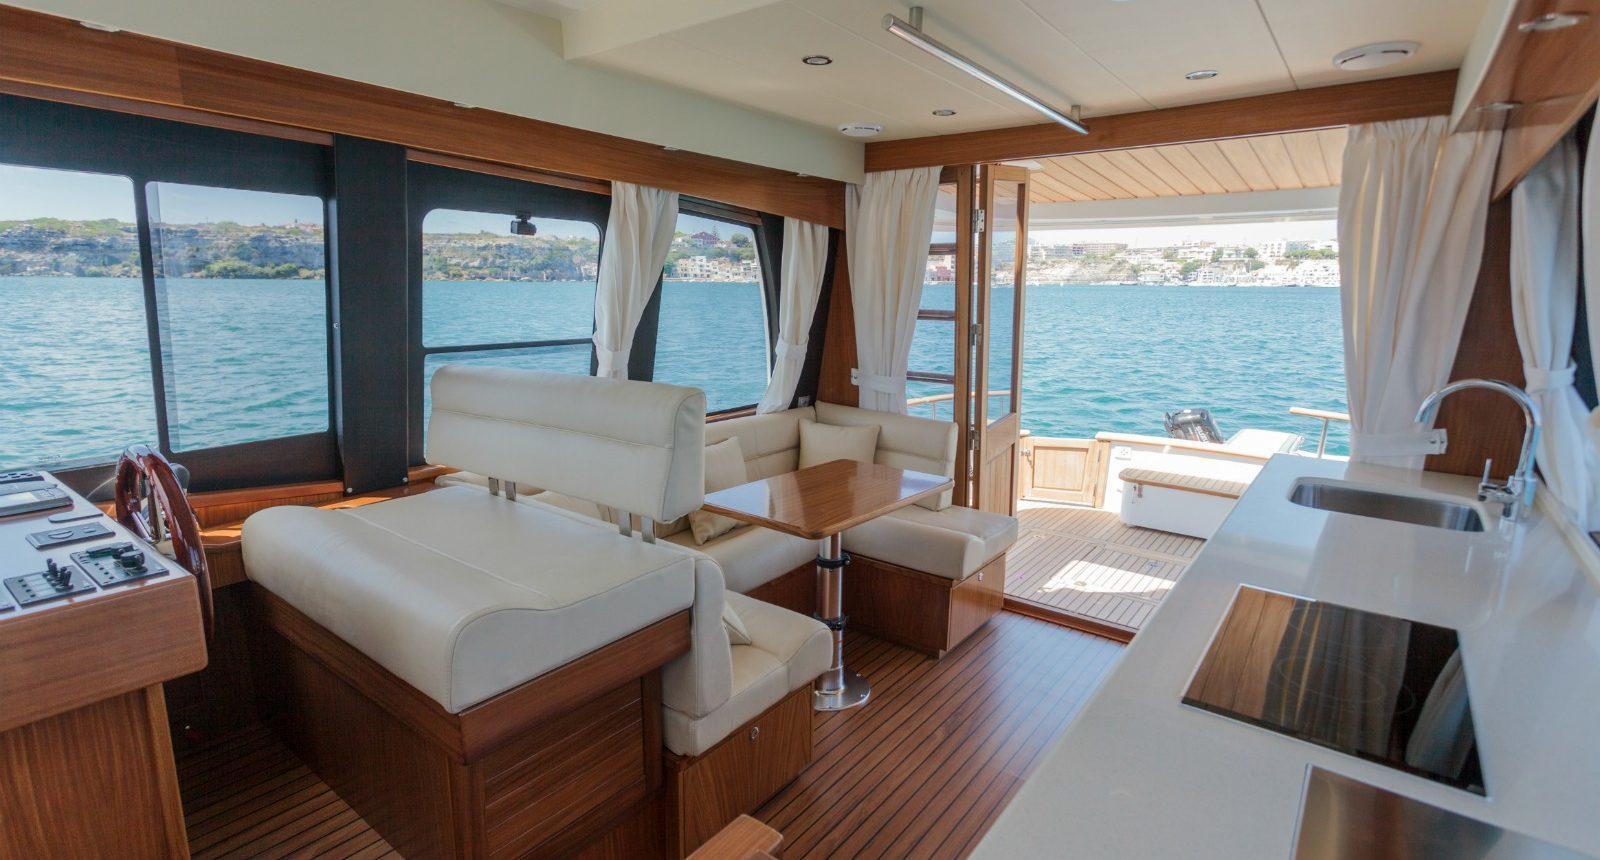 Islander 42 flybridge yacht for sale - salon and galley